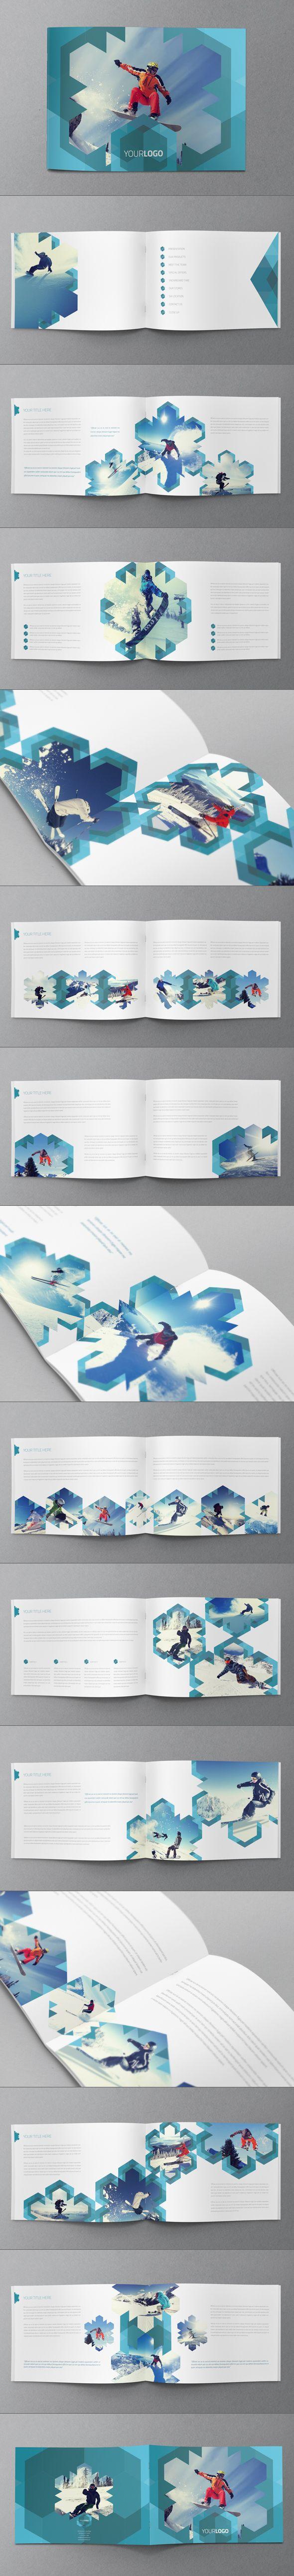 Ski/Snowboard Winter Brochure by Abra Design, via Behance